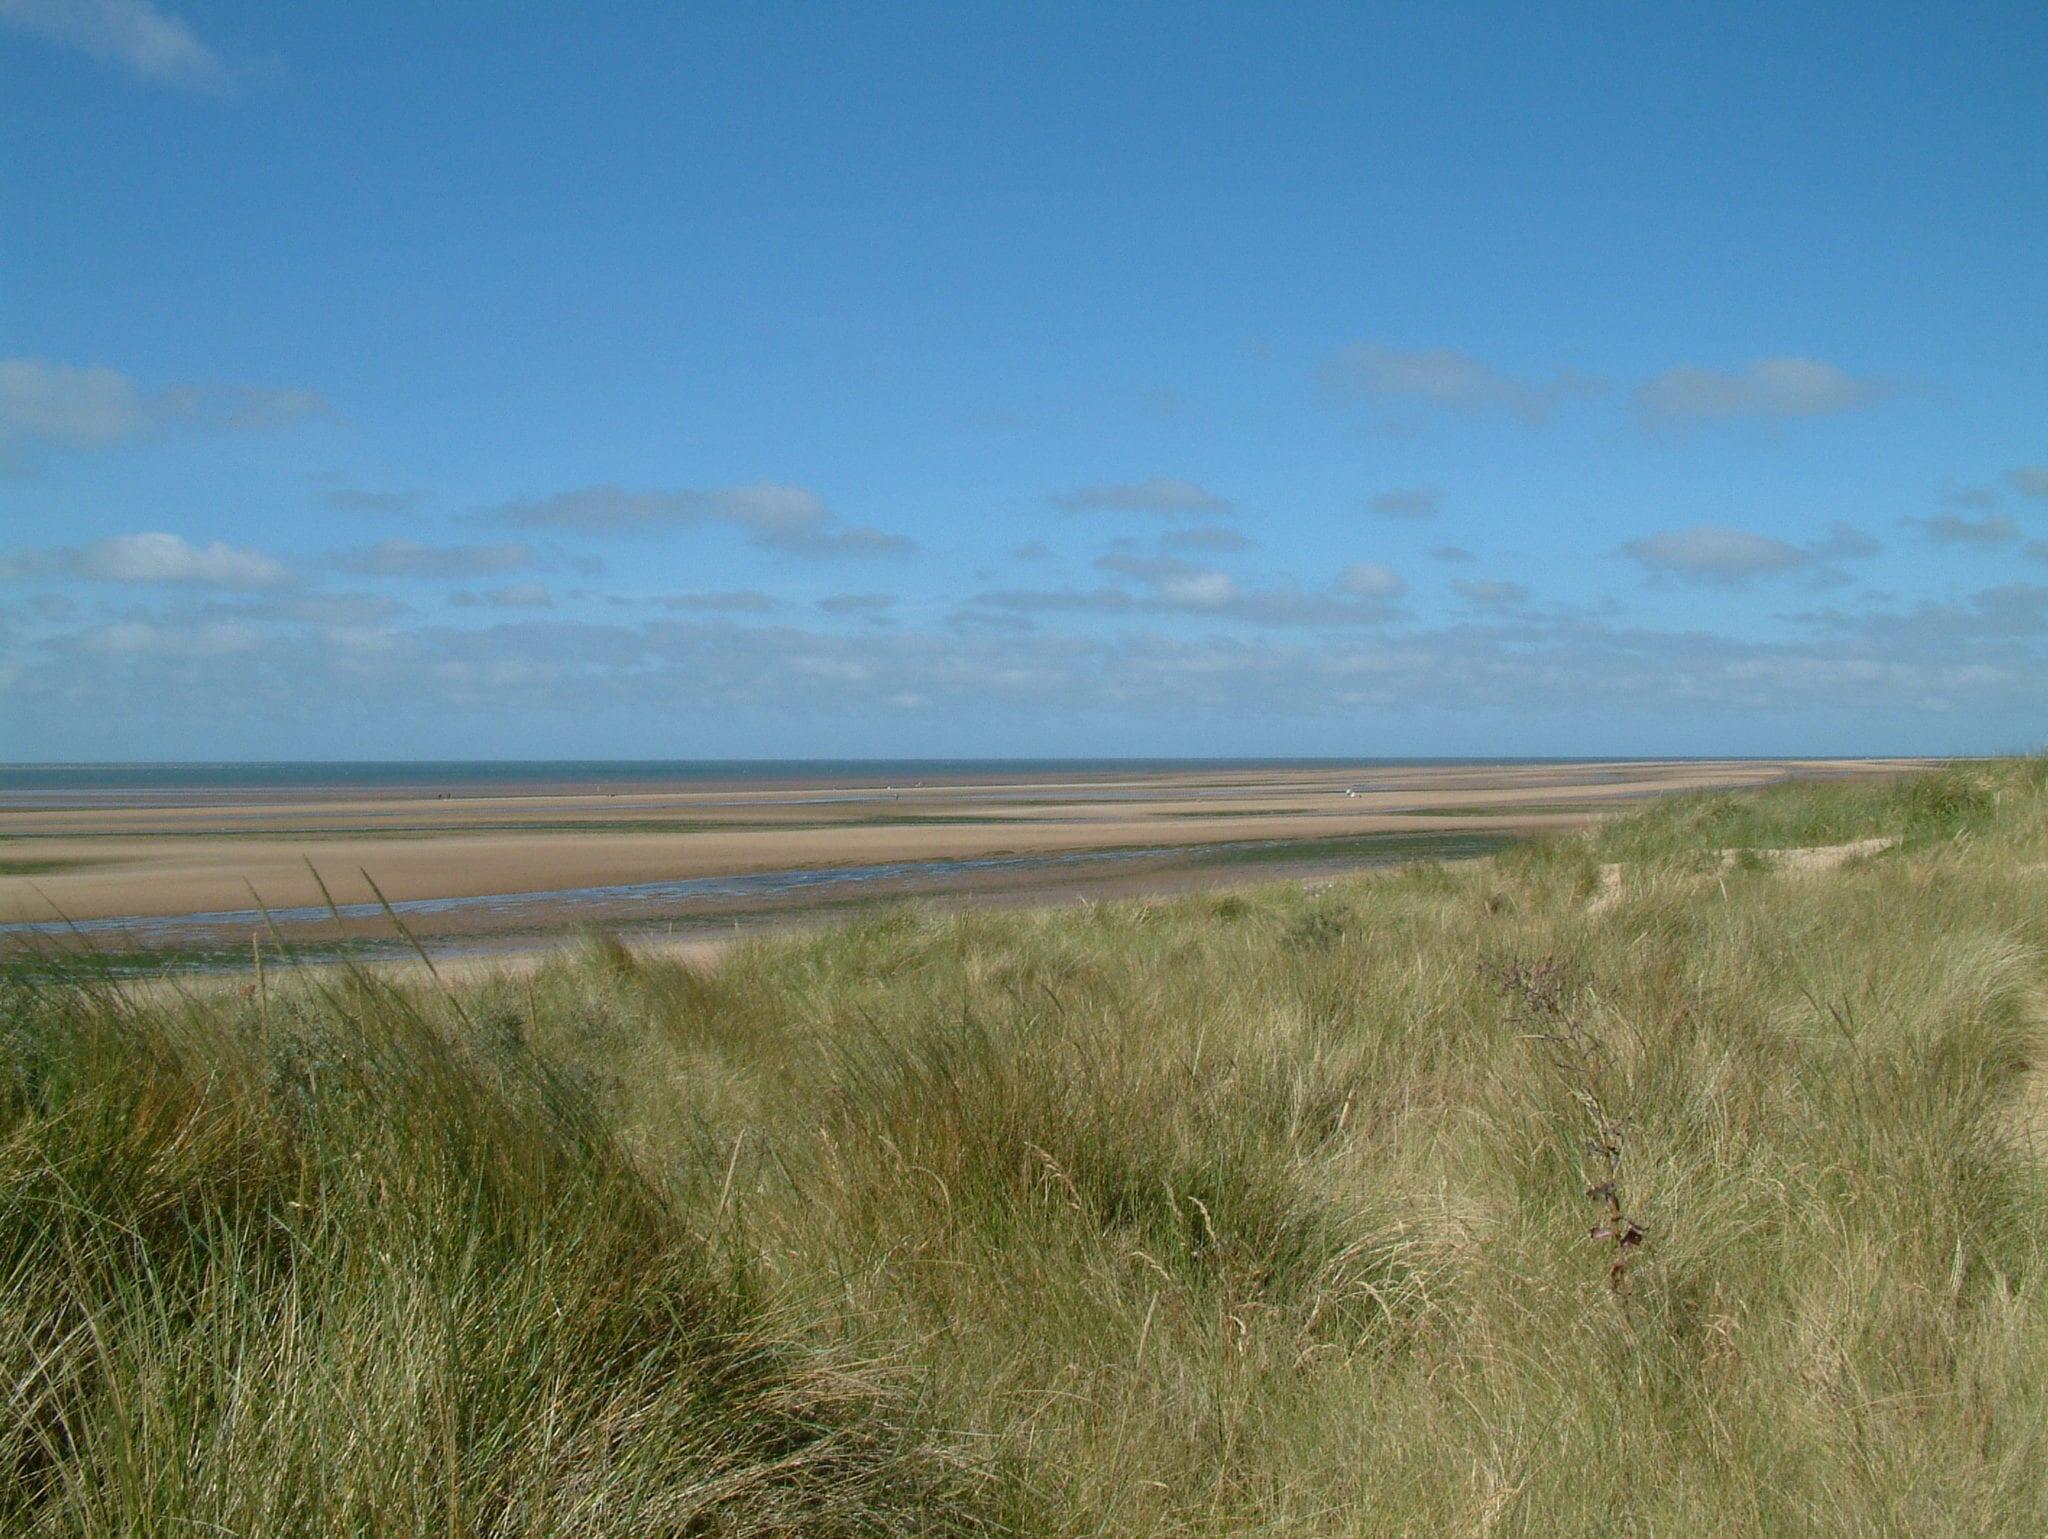 Dunes around the norfolk coast with sand grass on them